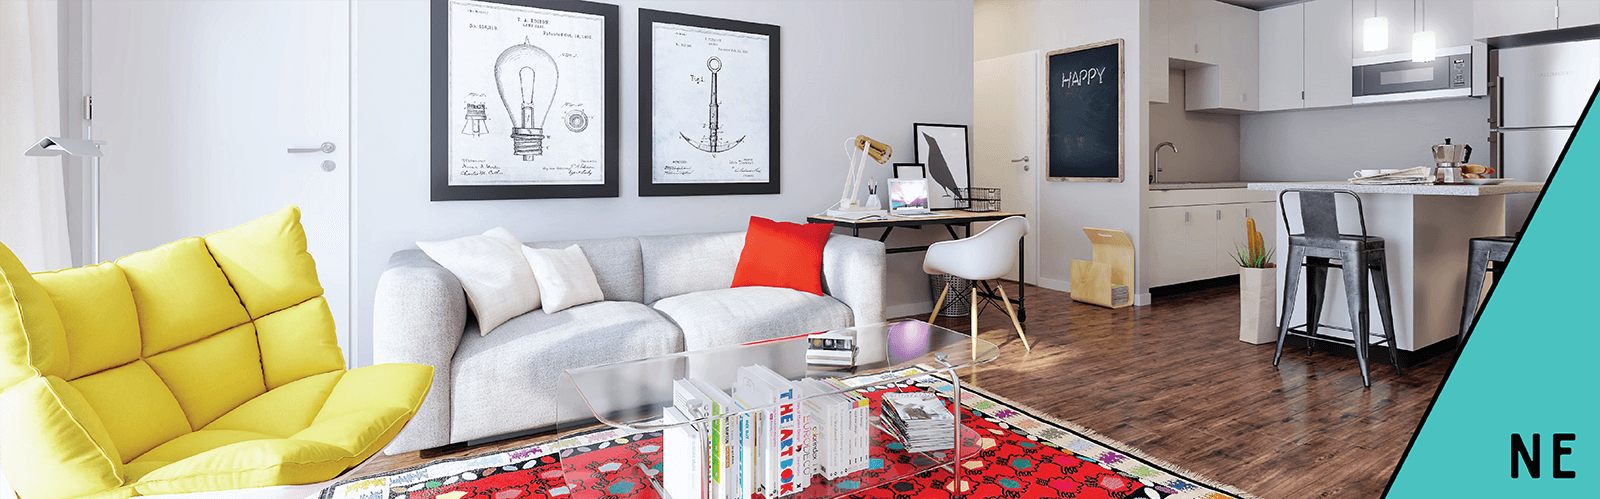 Living Area at Mezzo Apartments Northeast Minneapolis MN